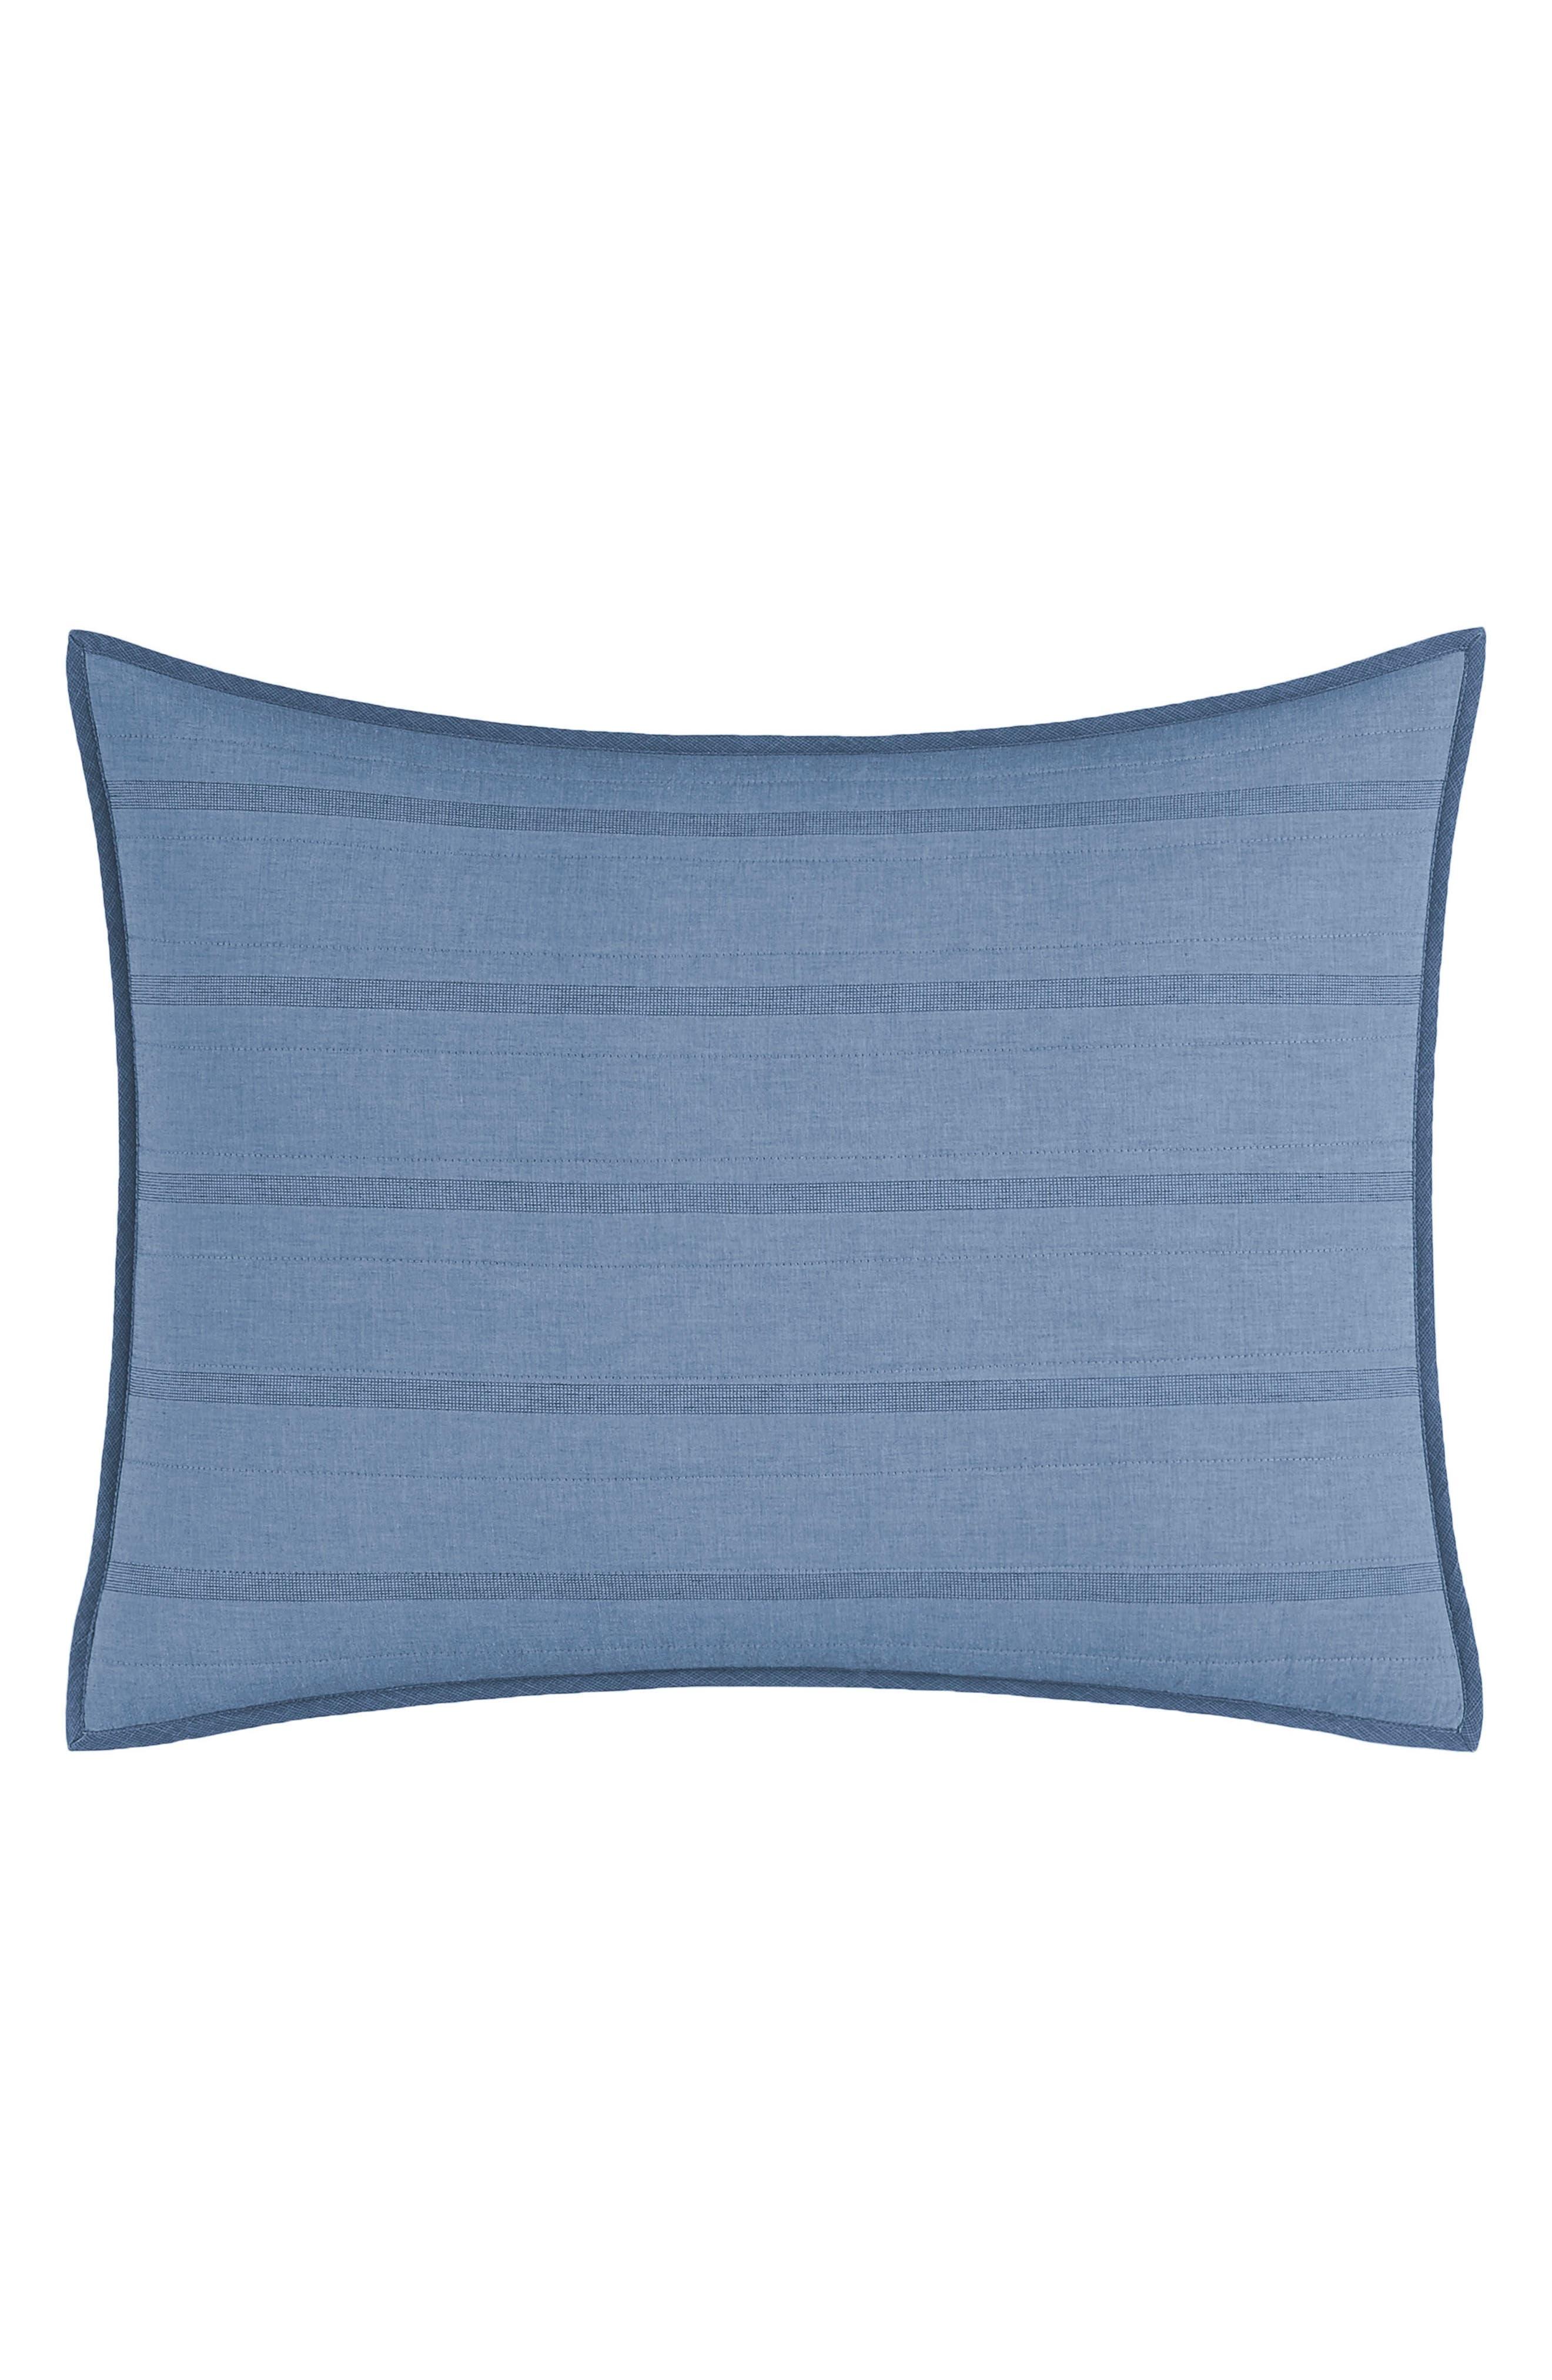 Buchanan Sham,                         Main,                         color, Medium Blue